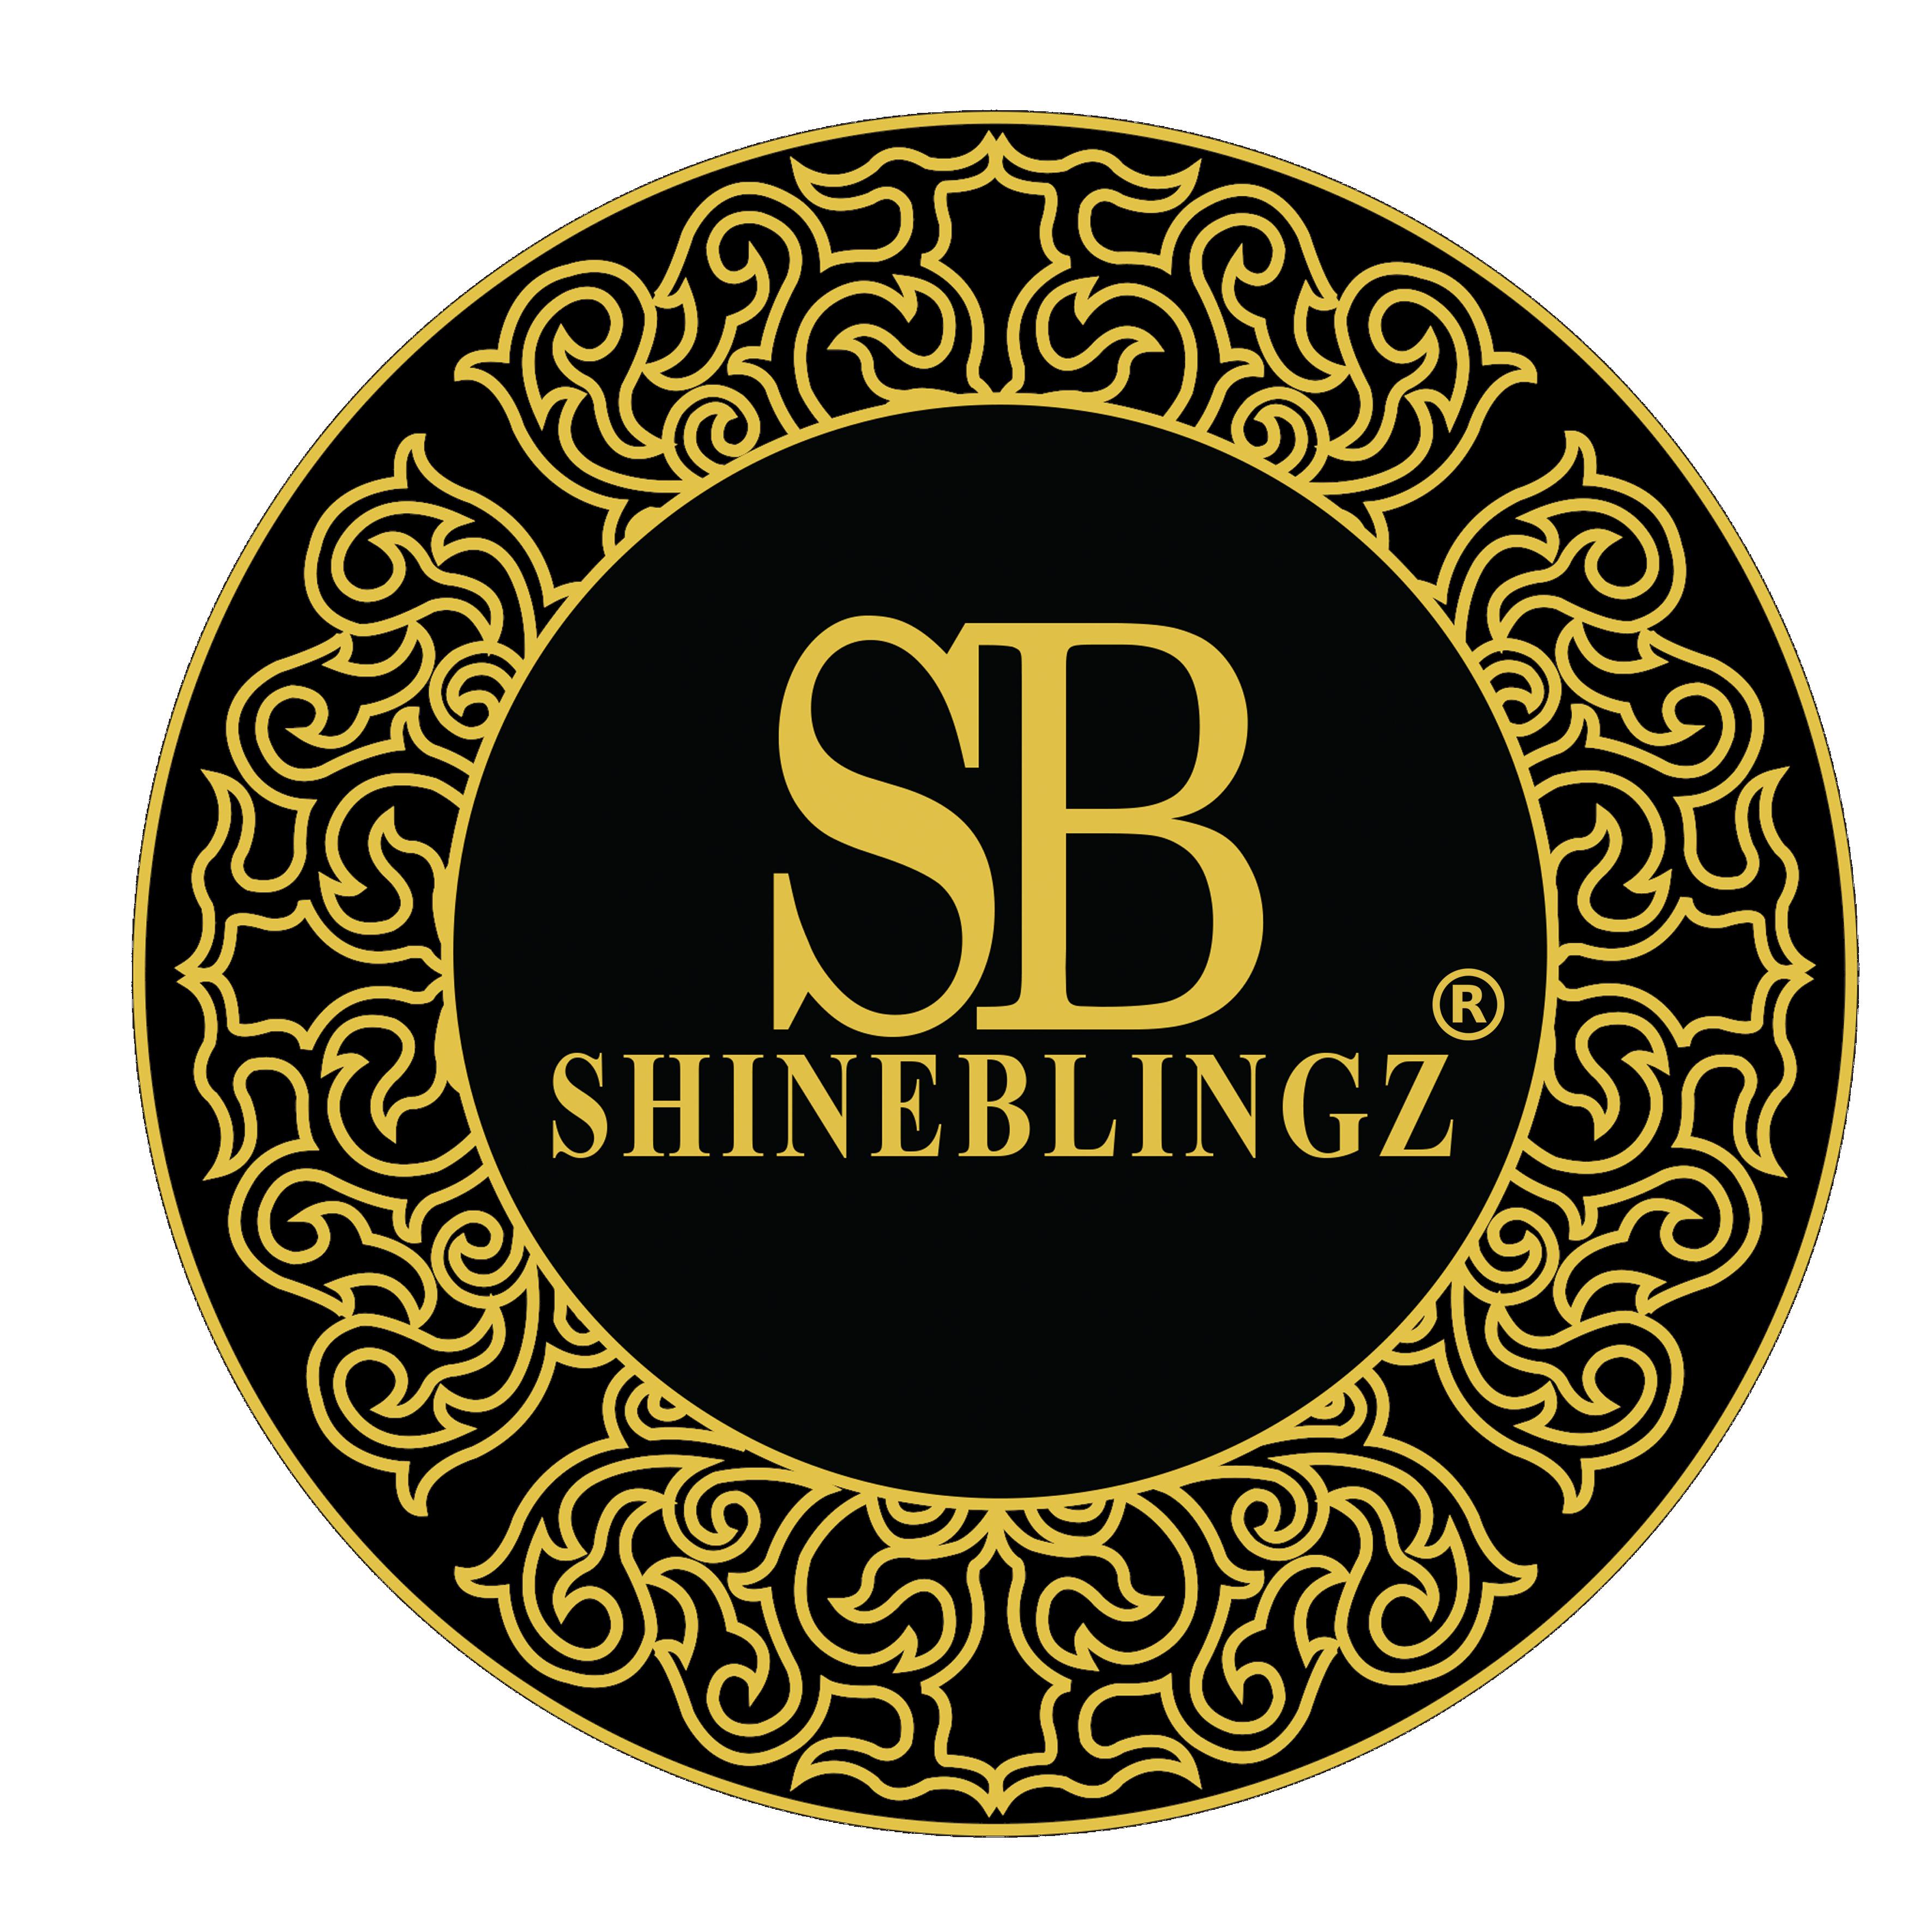 SHINEBLINGZ